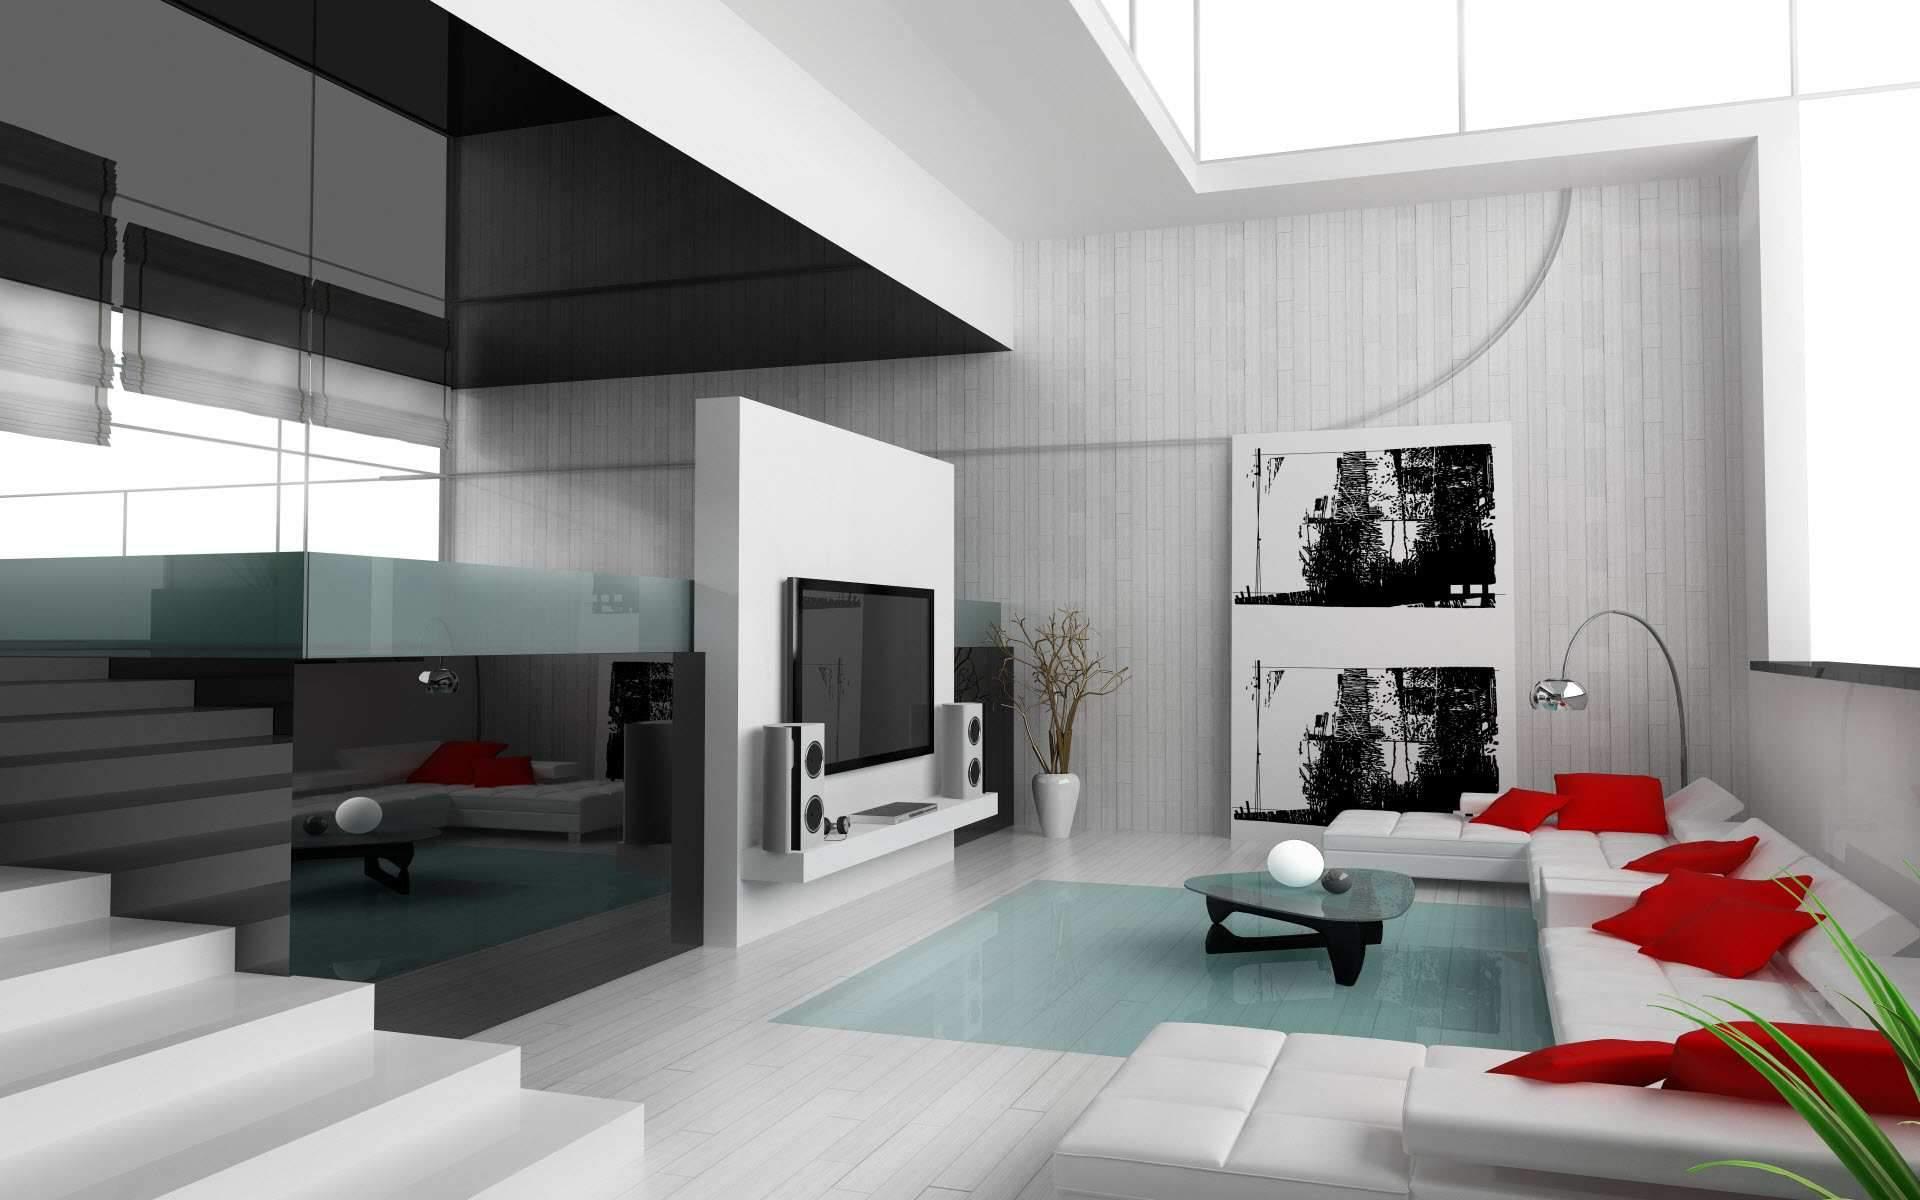 room-ideas-interior-design-living-room-cool-modern-living-room-ideas-2012-modern-style-living-rooms-modern-style-living-room-ideas-modern-style-living-room-furniture-modern-style-living-room-mo